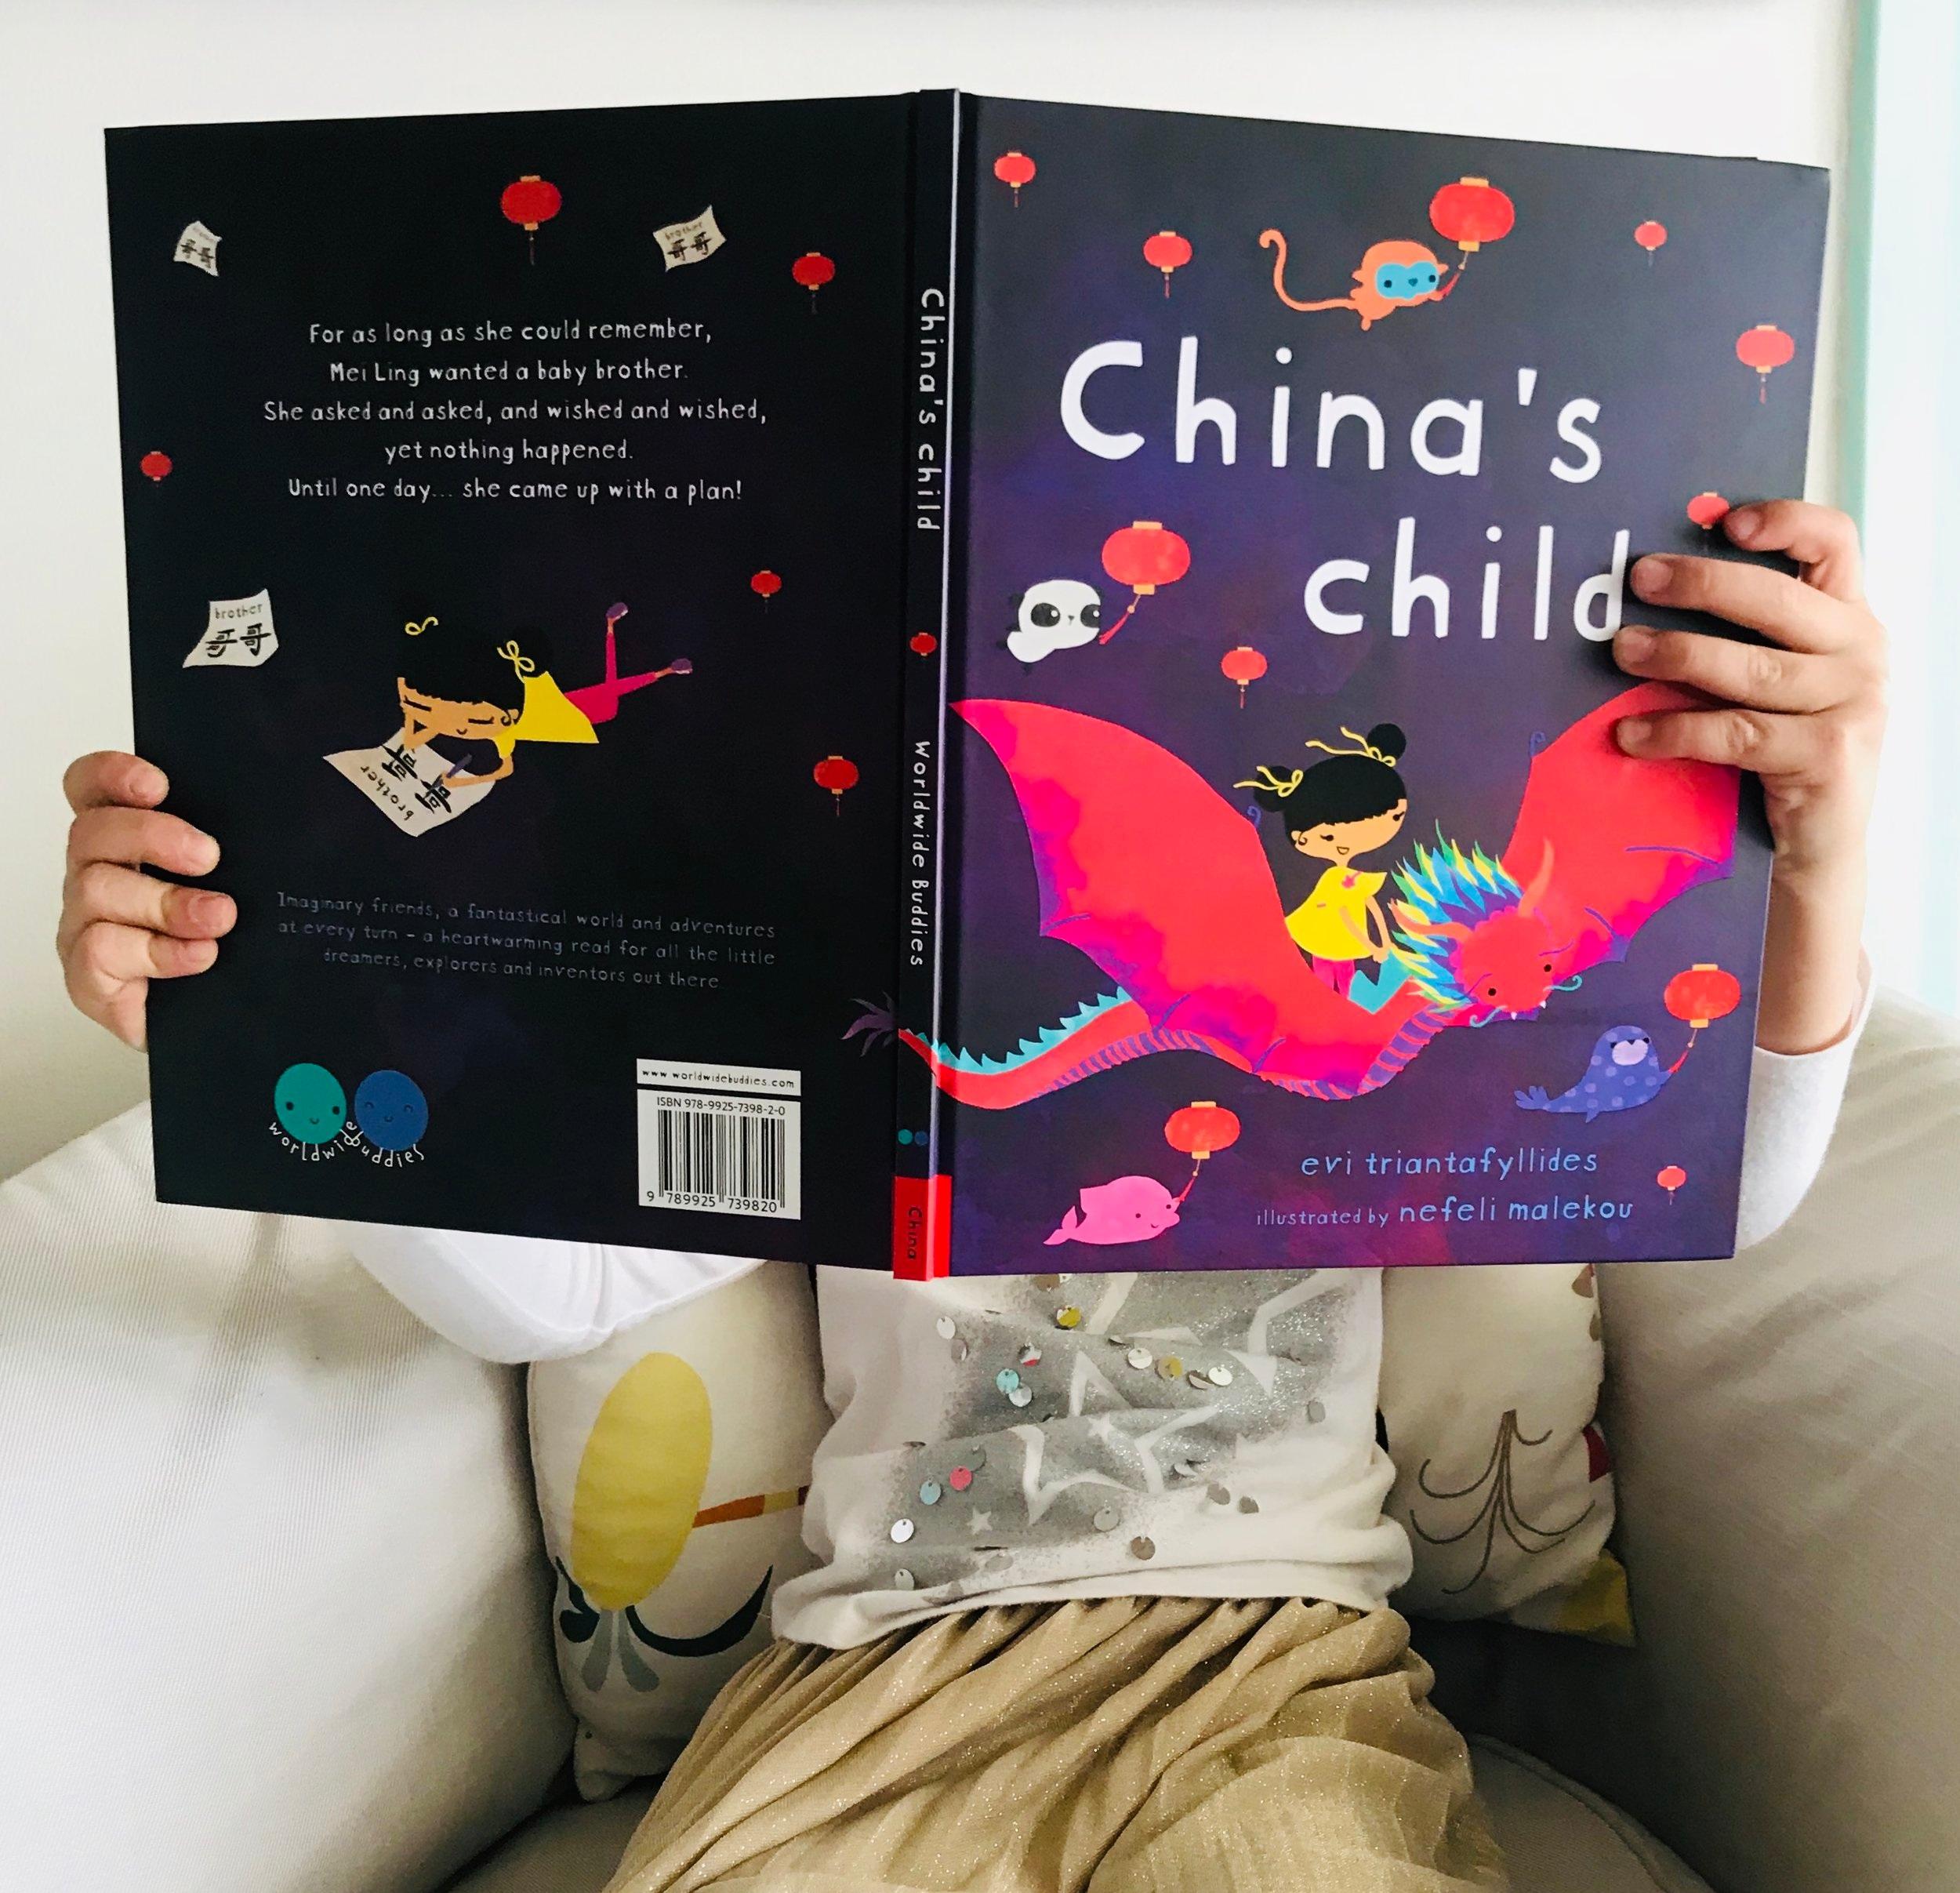 worldwide_buddies_china_book_1.jpg